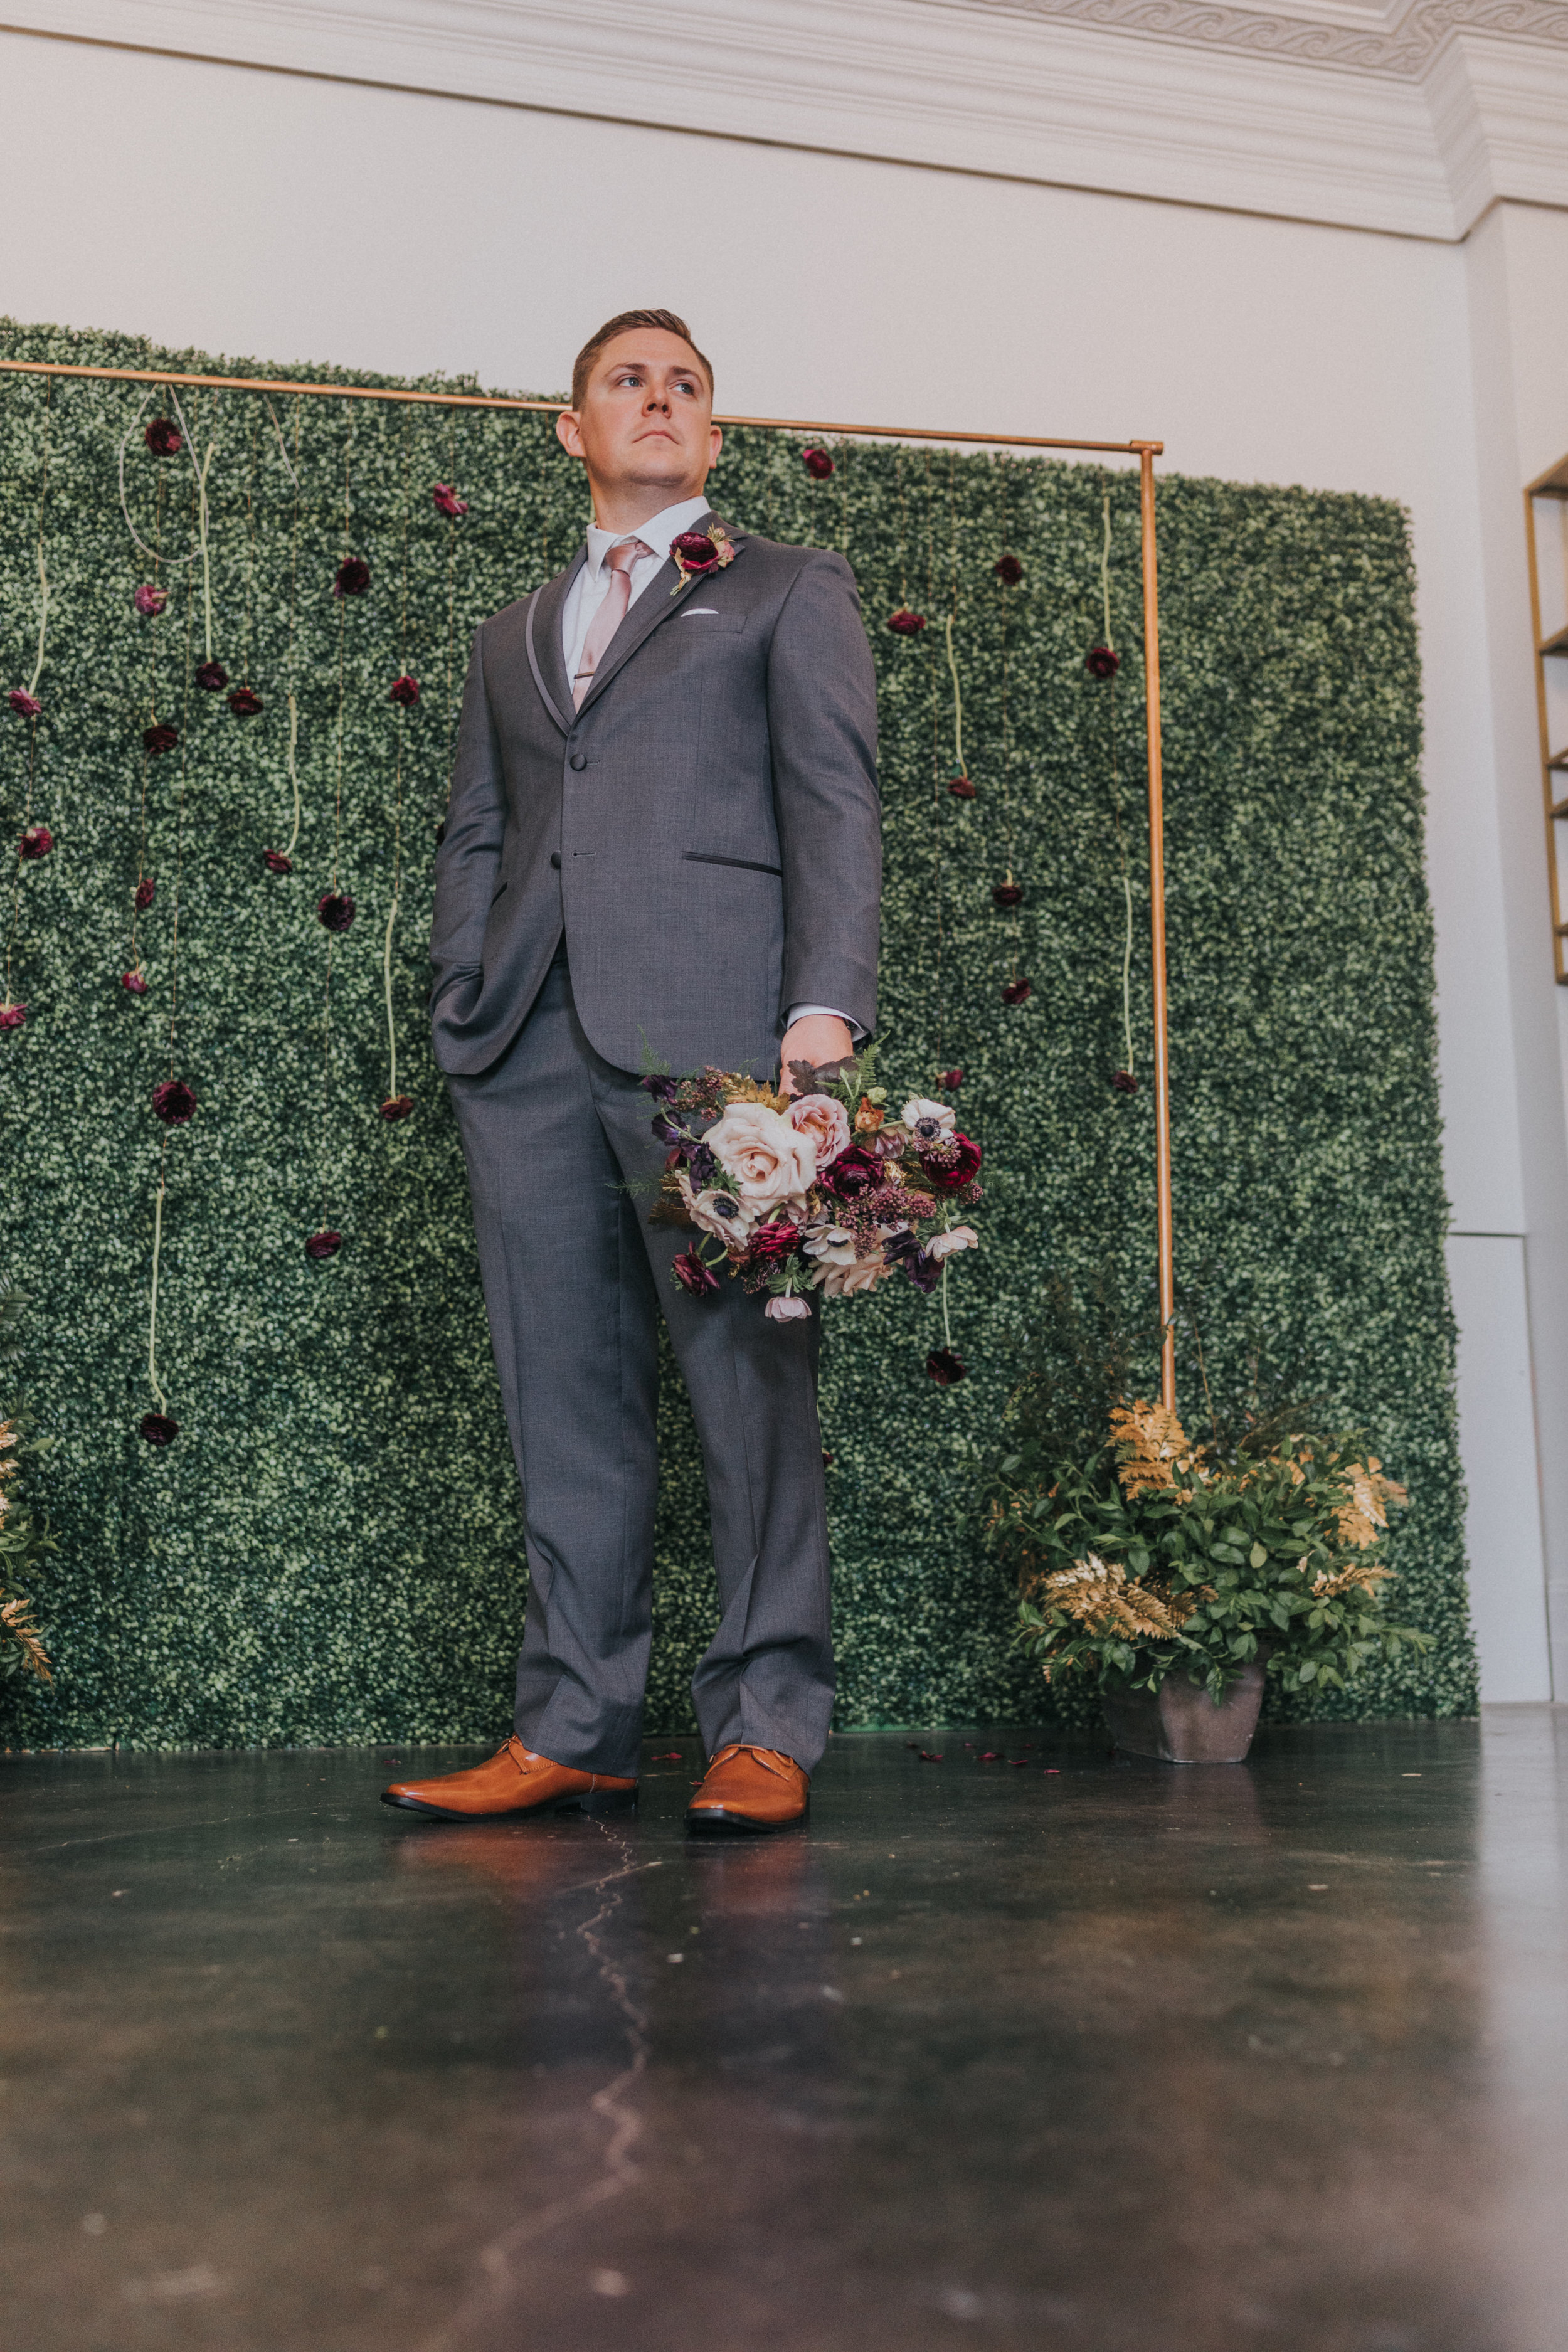 138 tiny-luxe-weddings-omaha-nebraska-midwest-empire-room.jpg